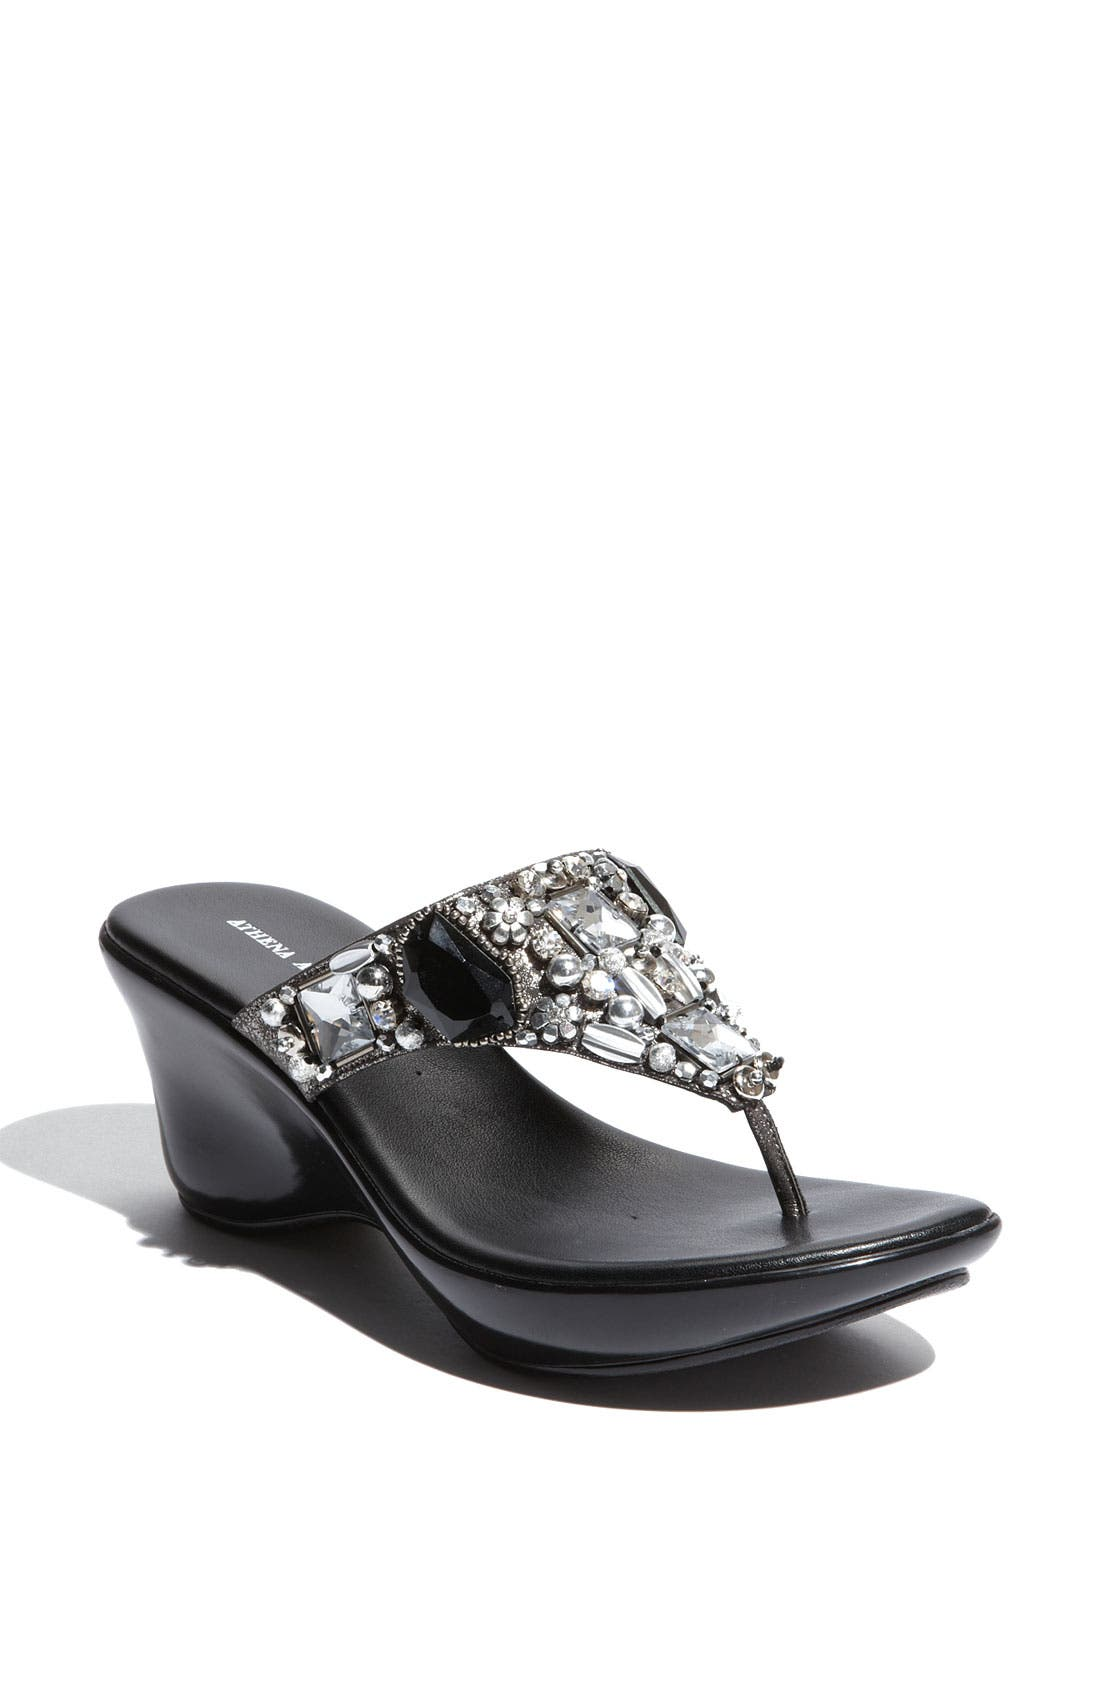 Main Image - Athena Alexander 'Suni' Wedge Sandal